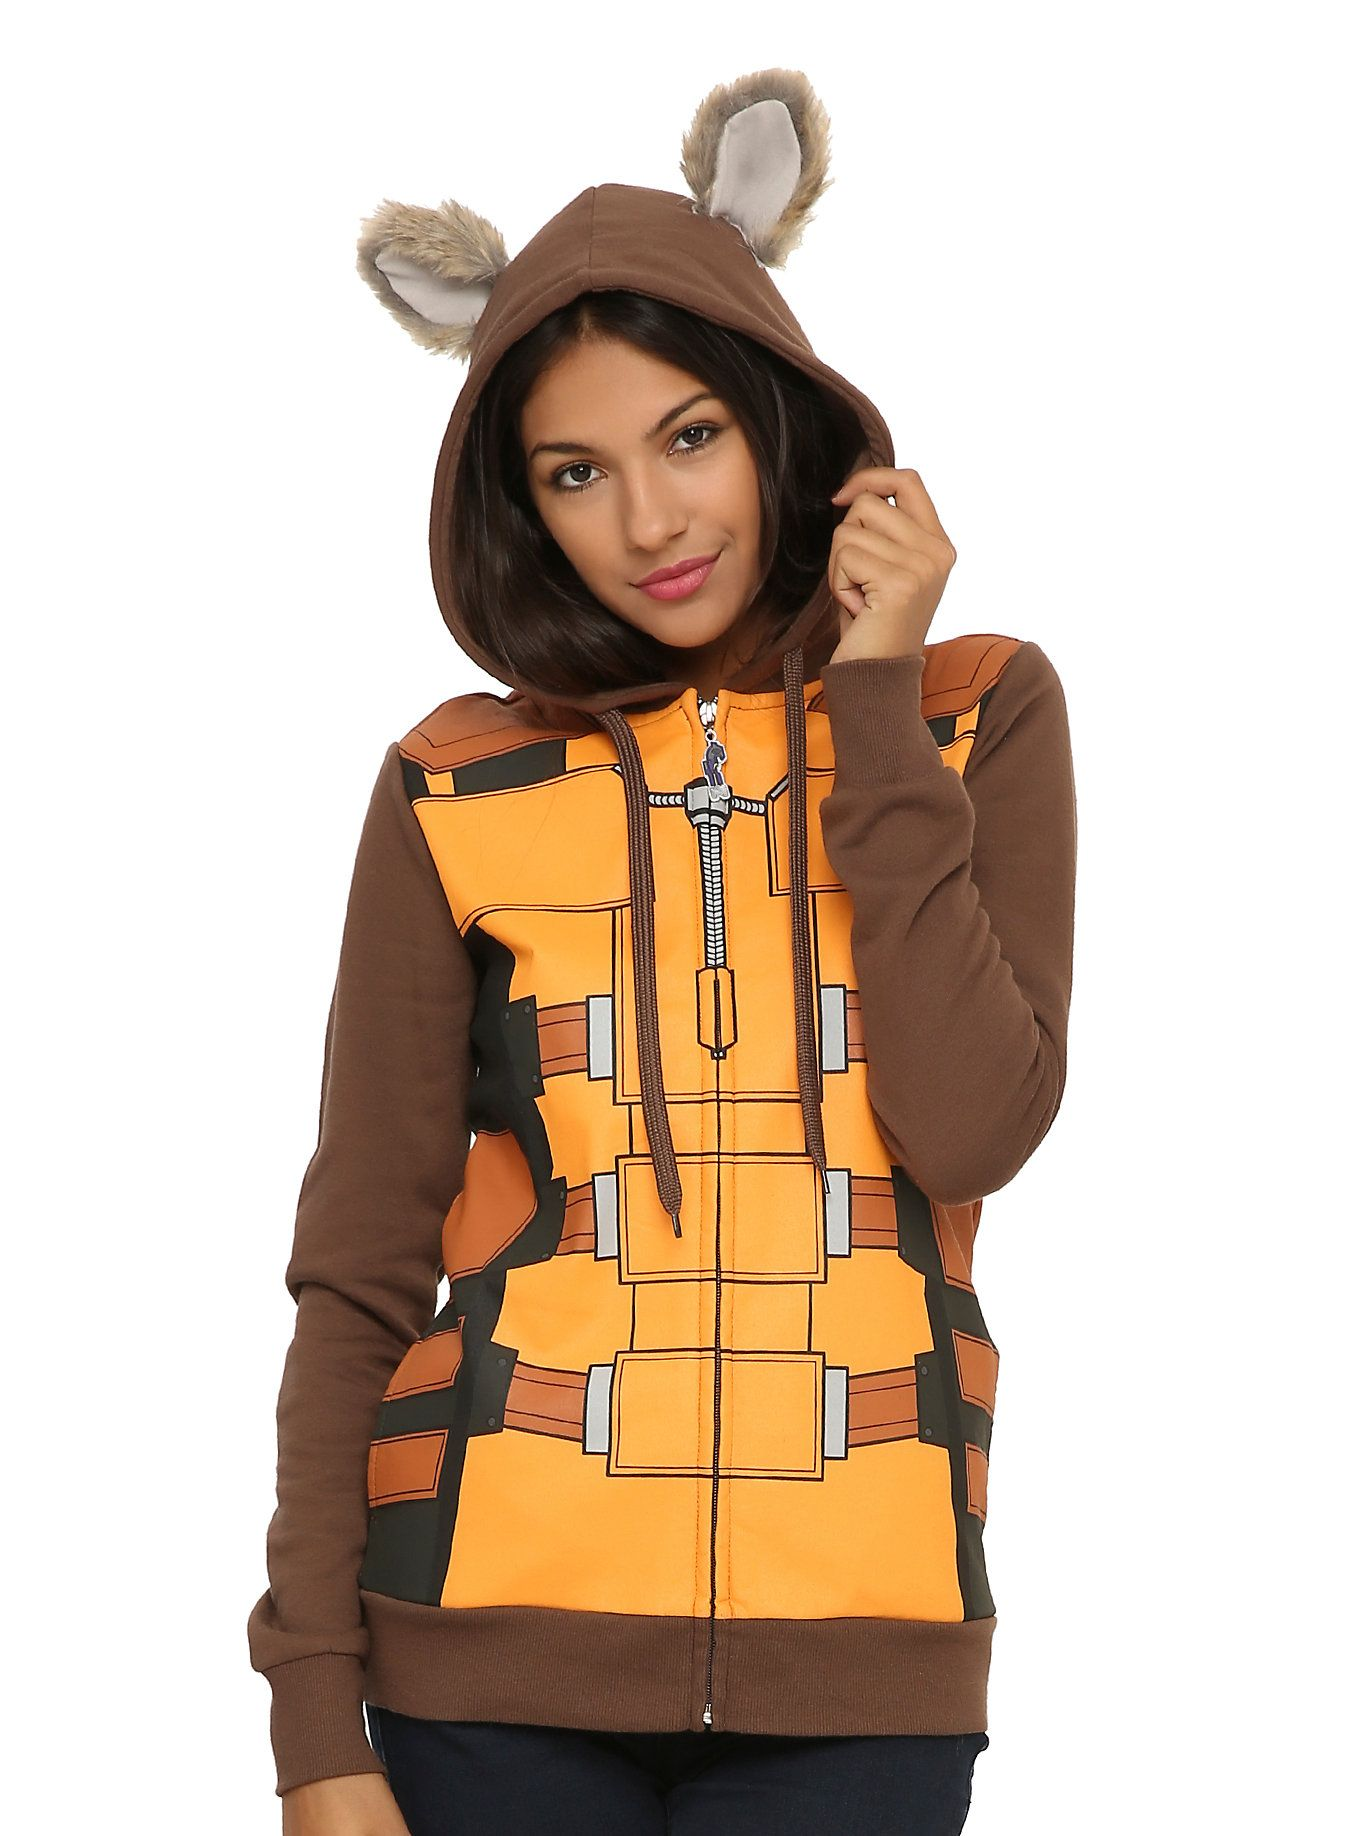 Marvel guardians of the galaxy rocket raccoon girls hoodie